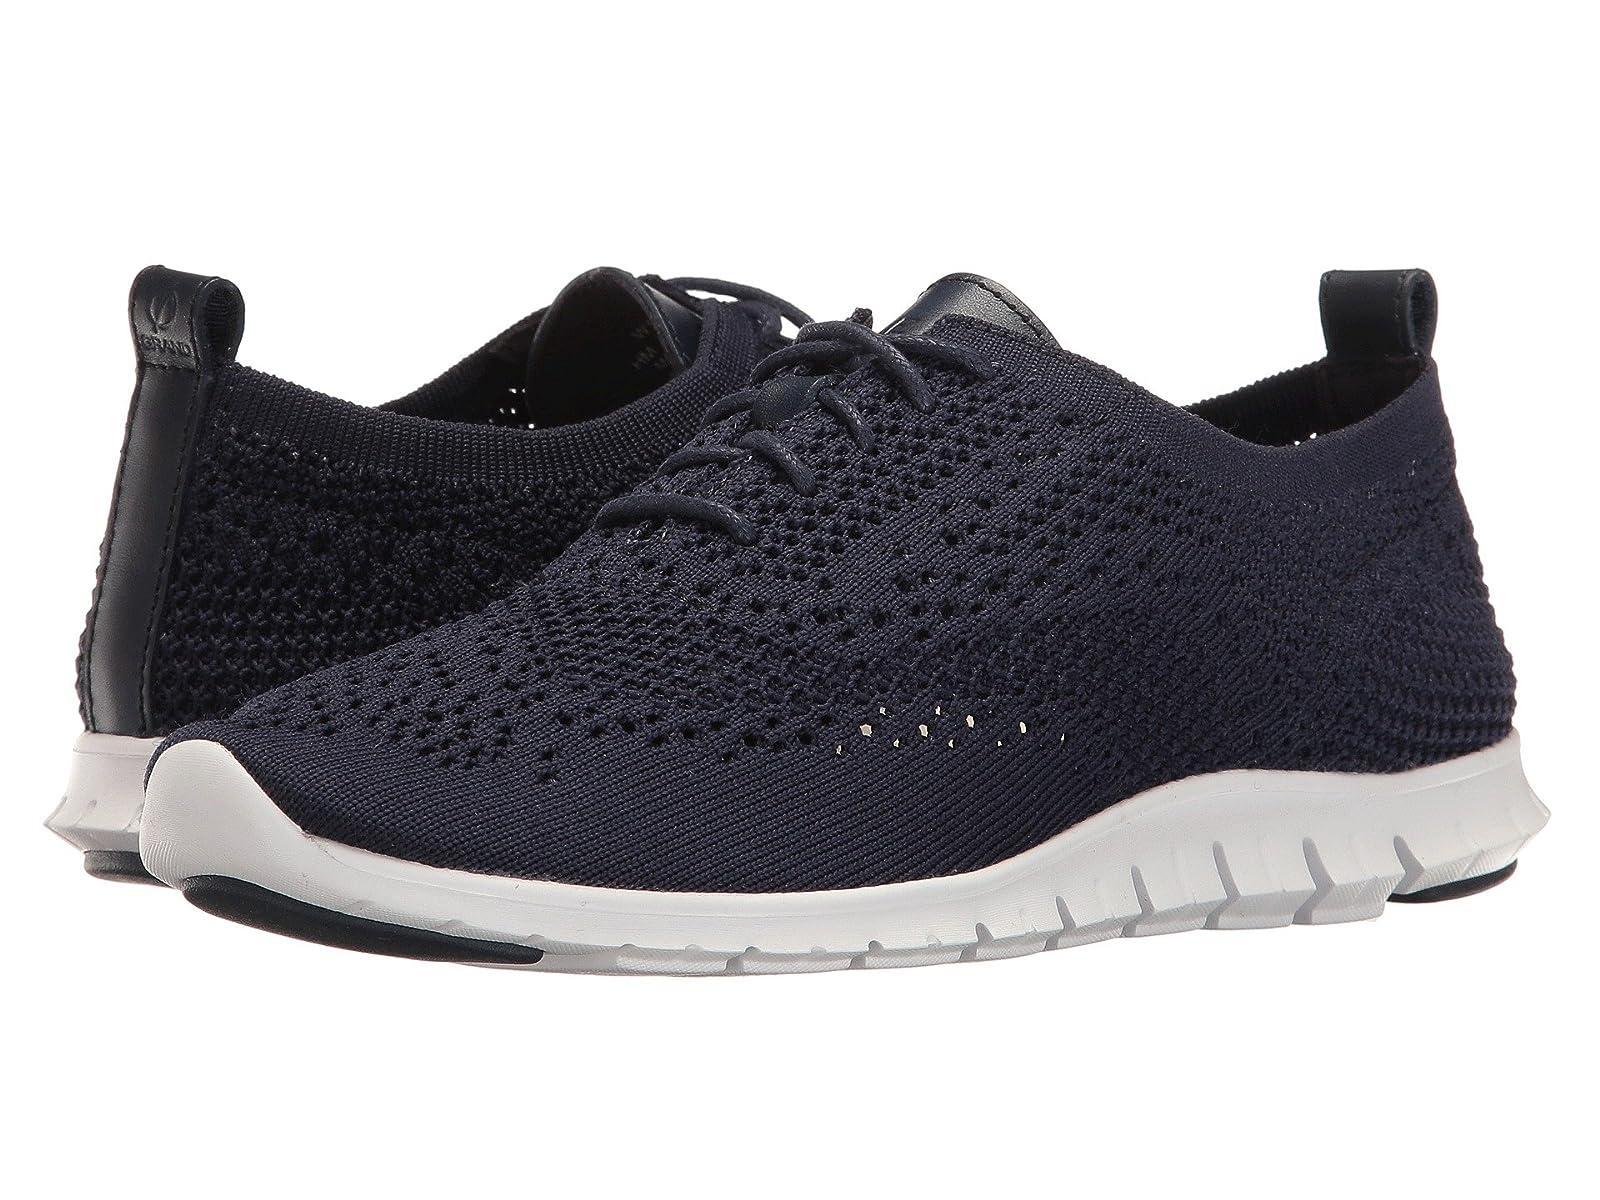 Cole Haan Zerogrand Stitchlite OxfordAtmospheric grades have affordable shoes